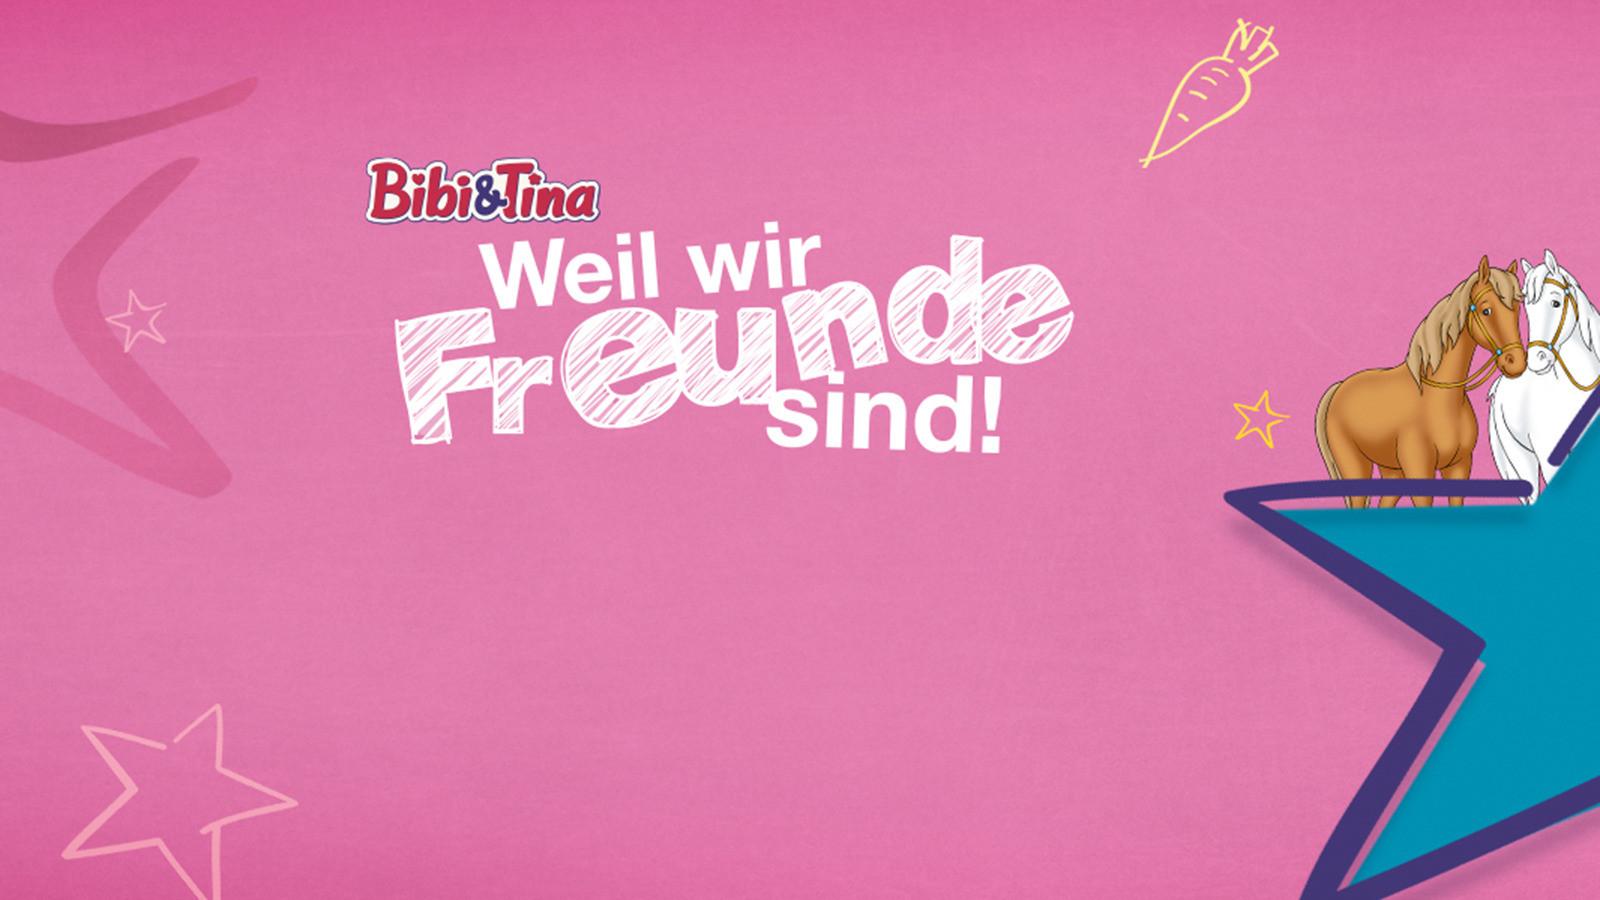 Bibi Und Tina Zdf Mediathek Neu Bibi & Tina 4 Inspirierend Bibi Und Tina Auf Amadeus Und Sabrina Fotografieren